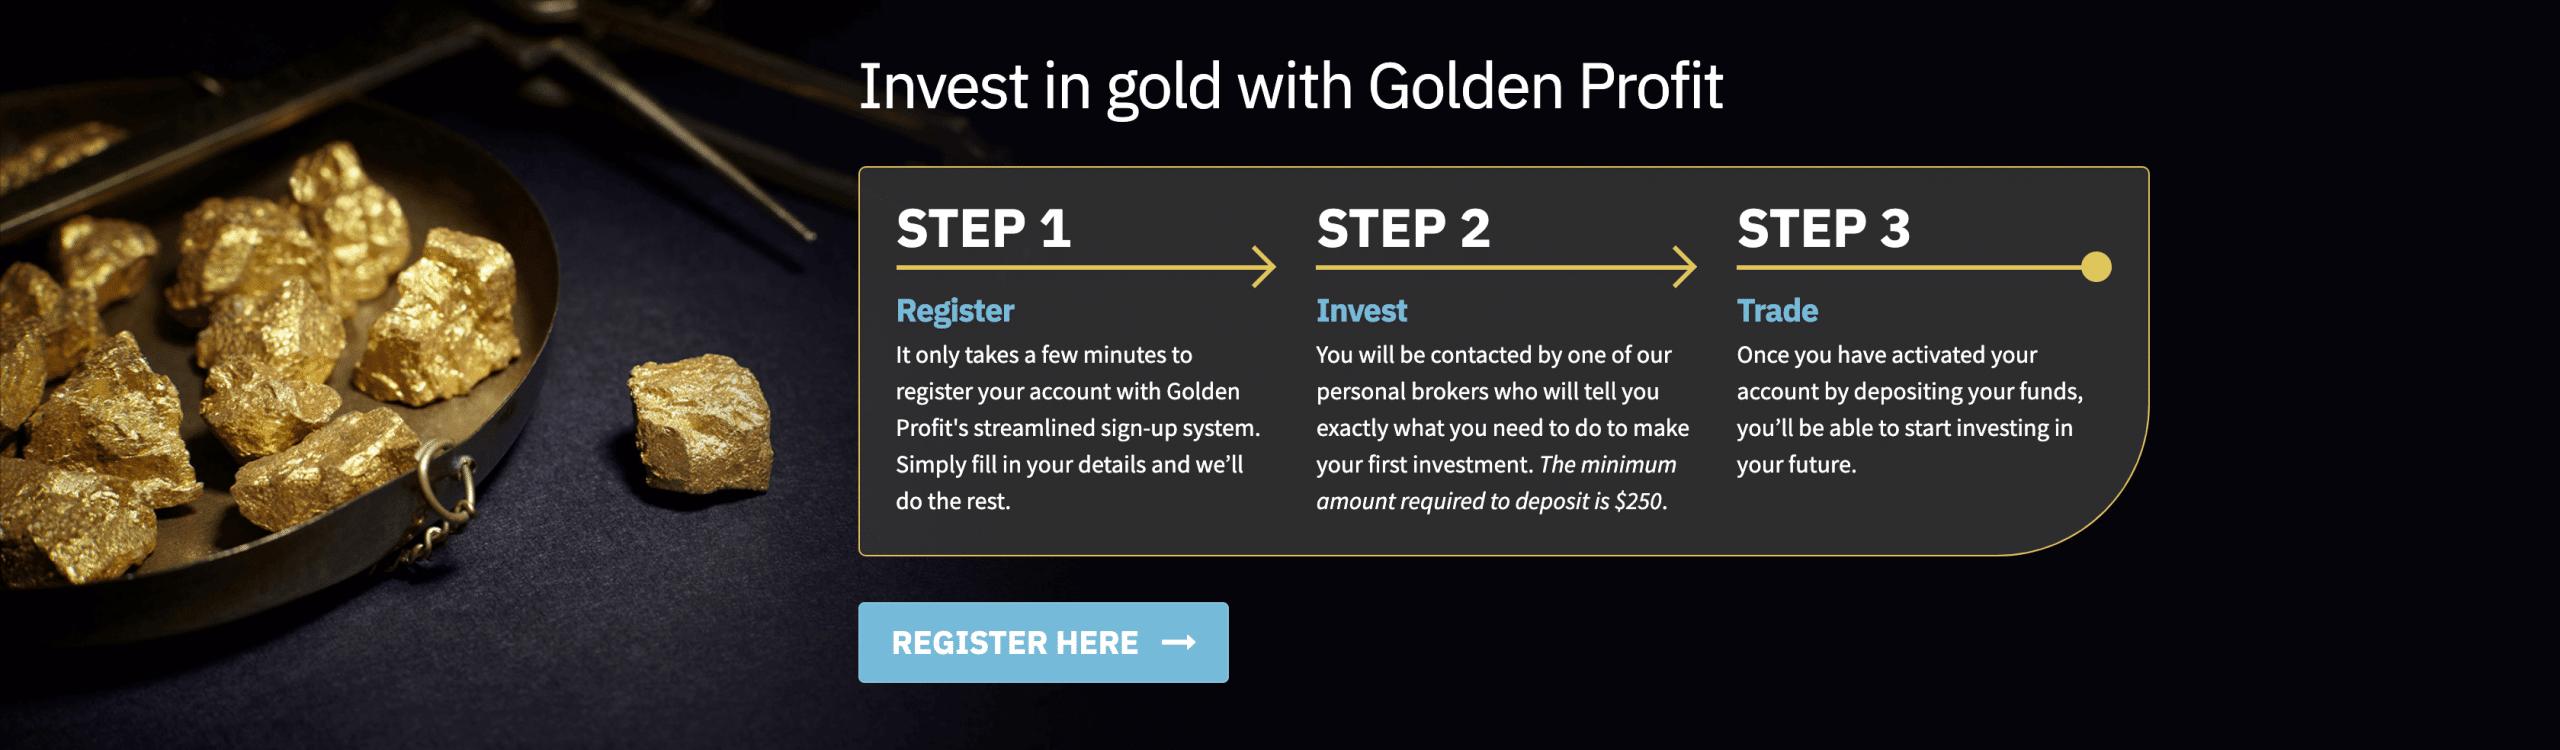 Wie funktioniert Golden Profit